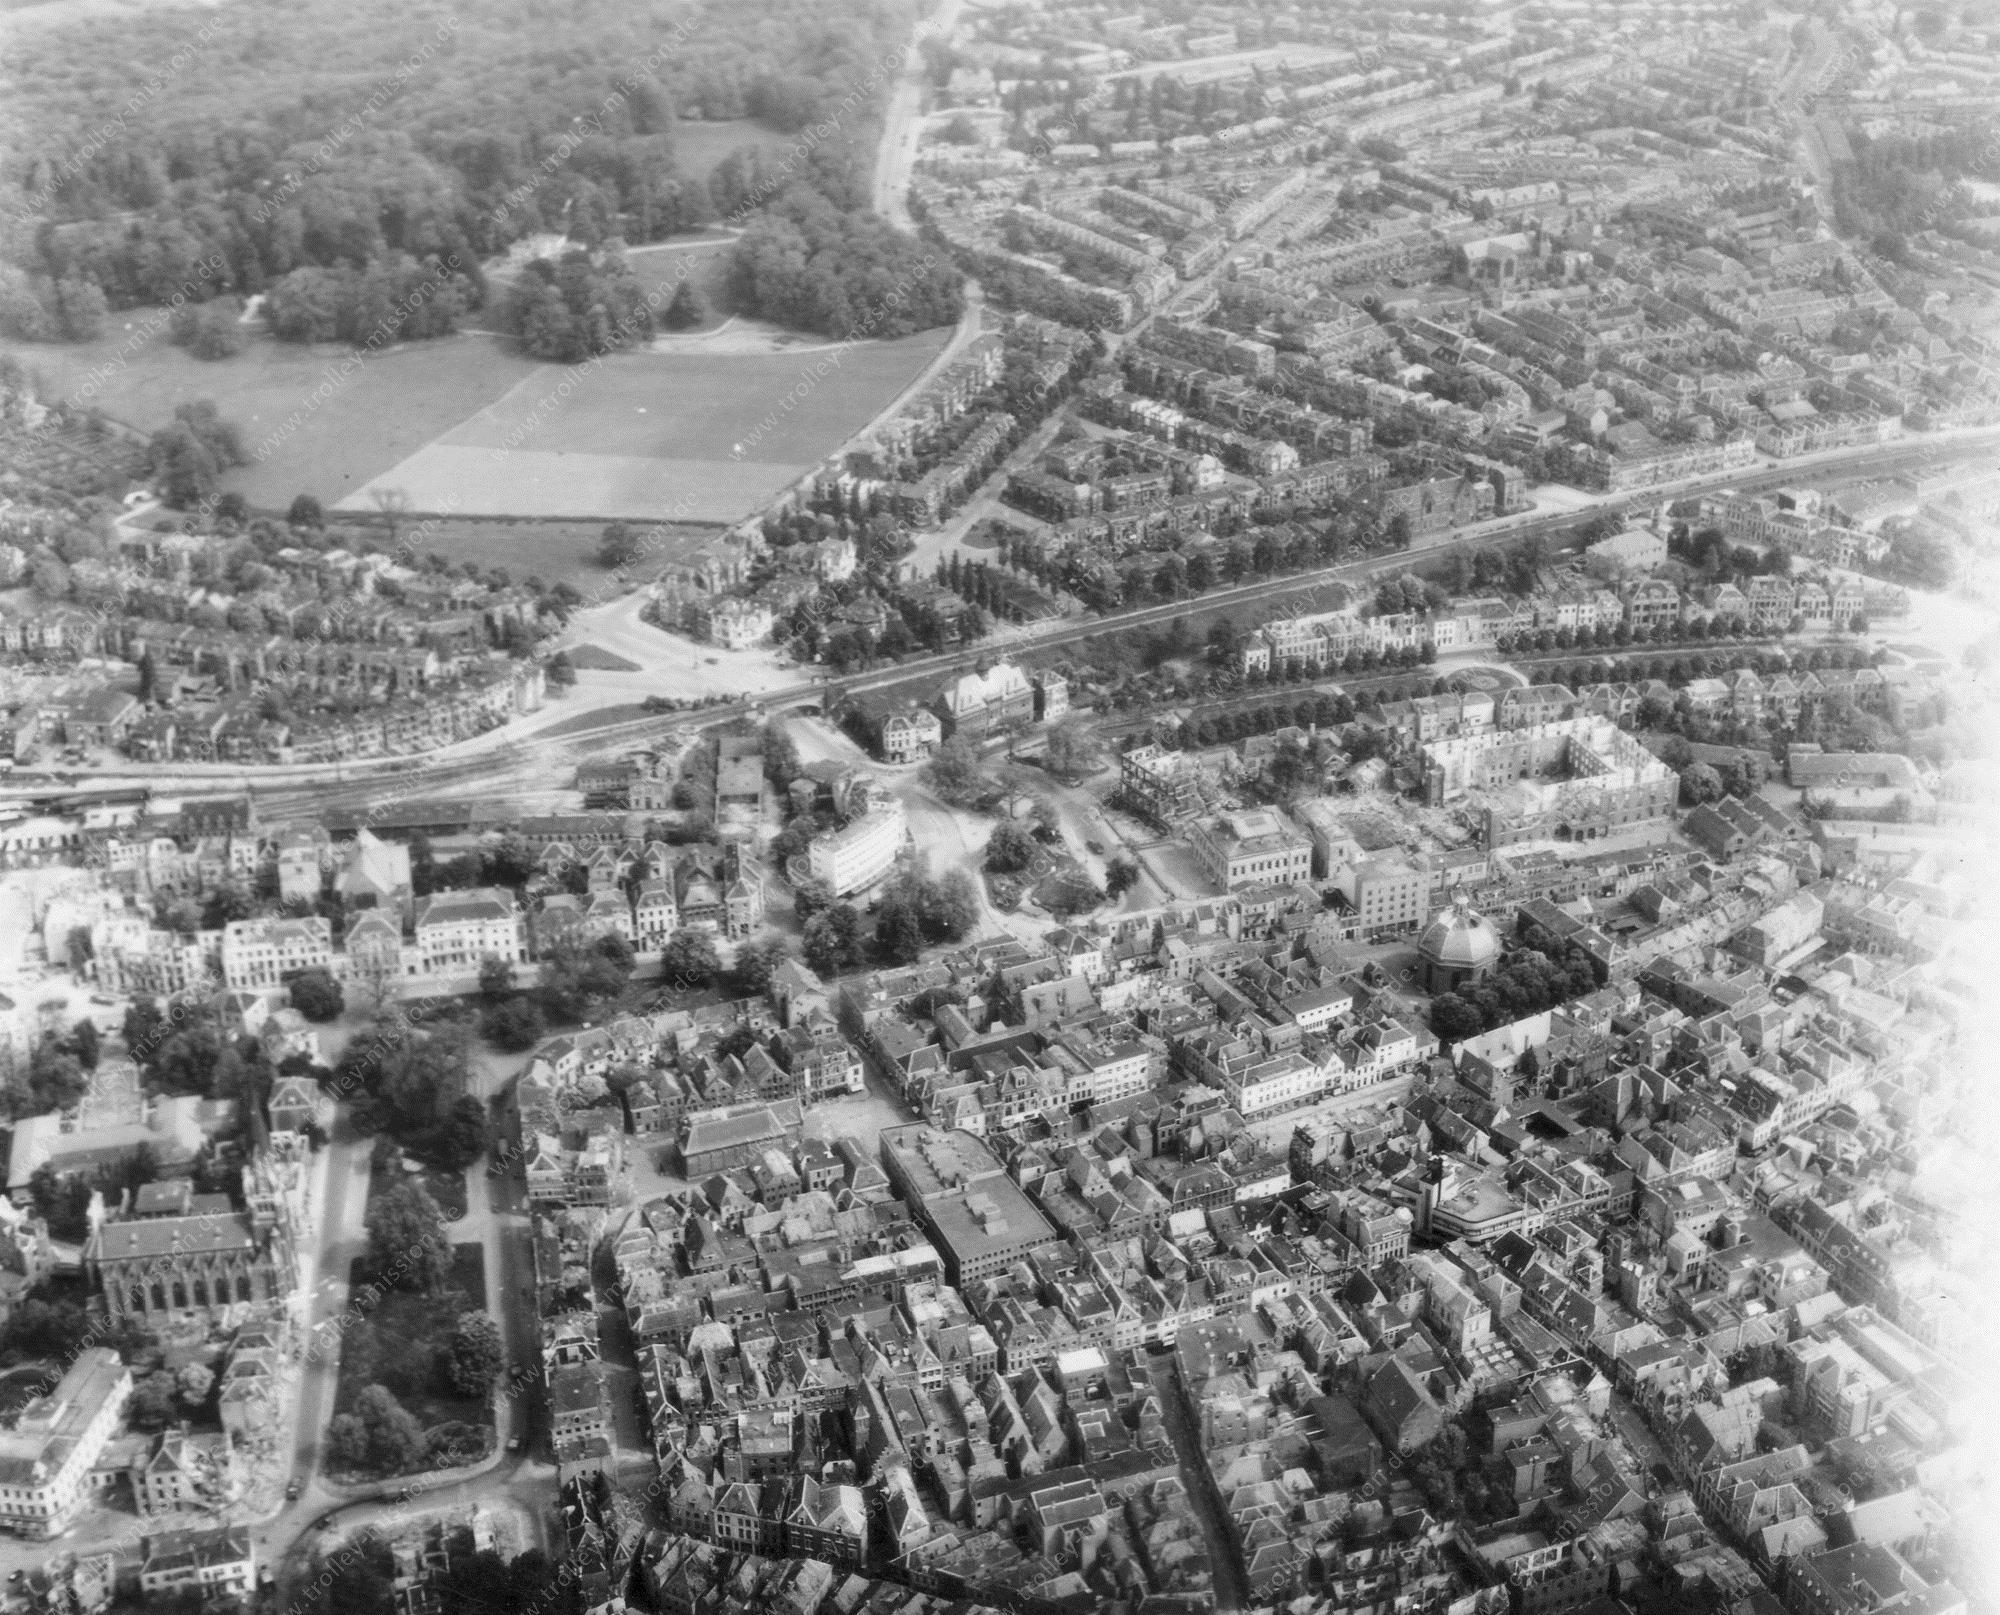 Luchtfoto Arnhem en Willemskazerne met Willemsplein (Gele Rijders Plein) in de Tweede Wereldoorlog